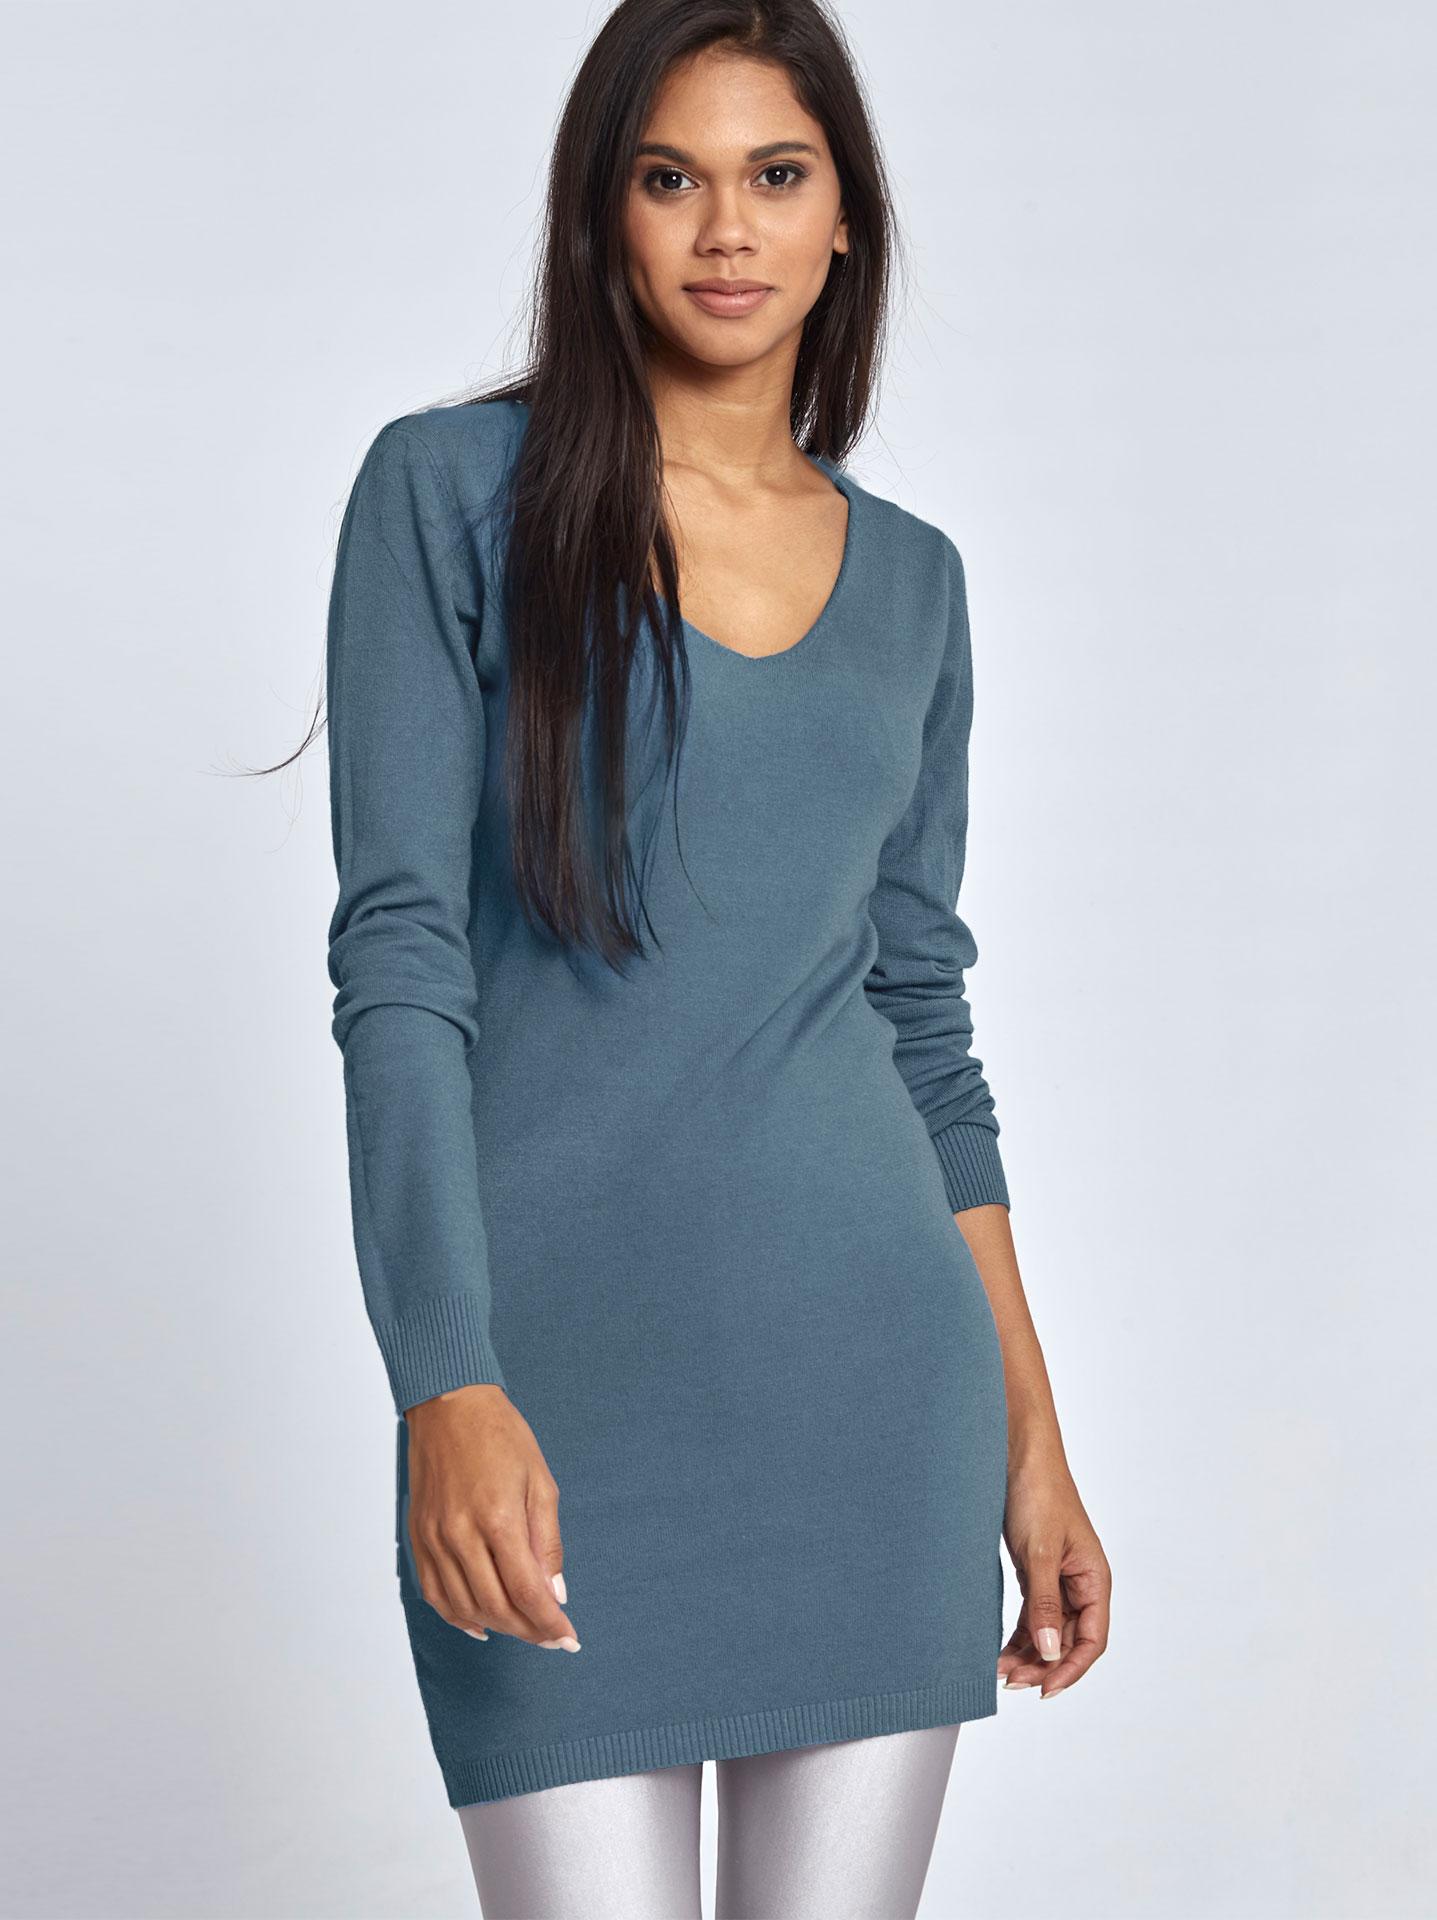 92e7e0e1bd46 Μακρύ πουλόβερ σε μπλε ραφ